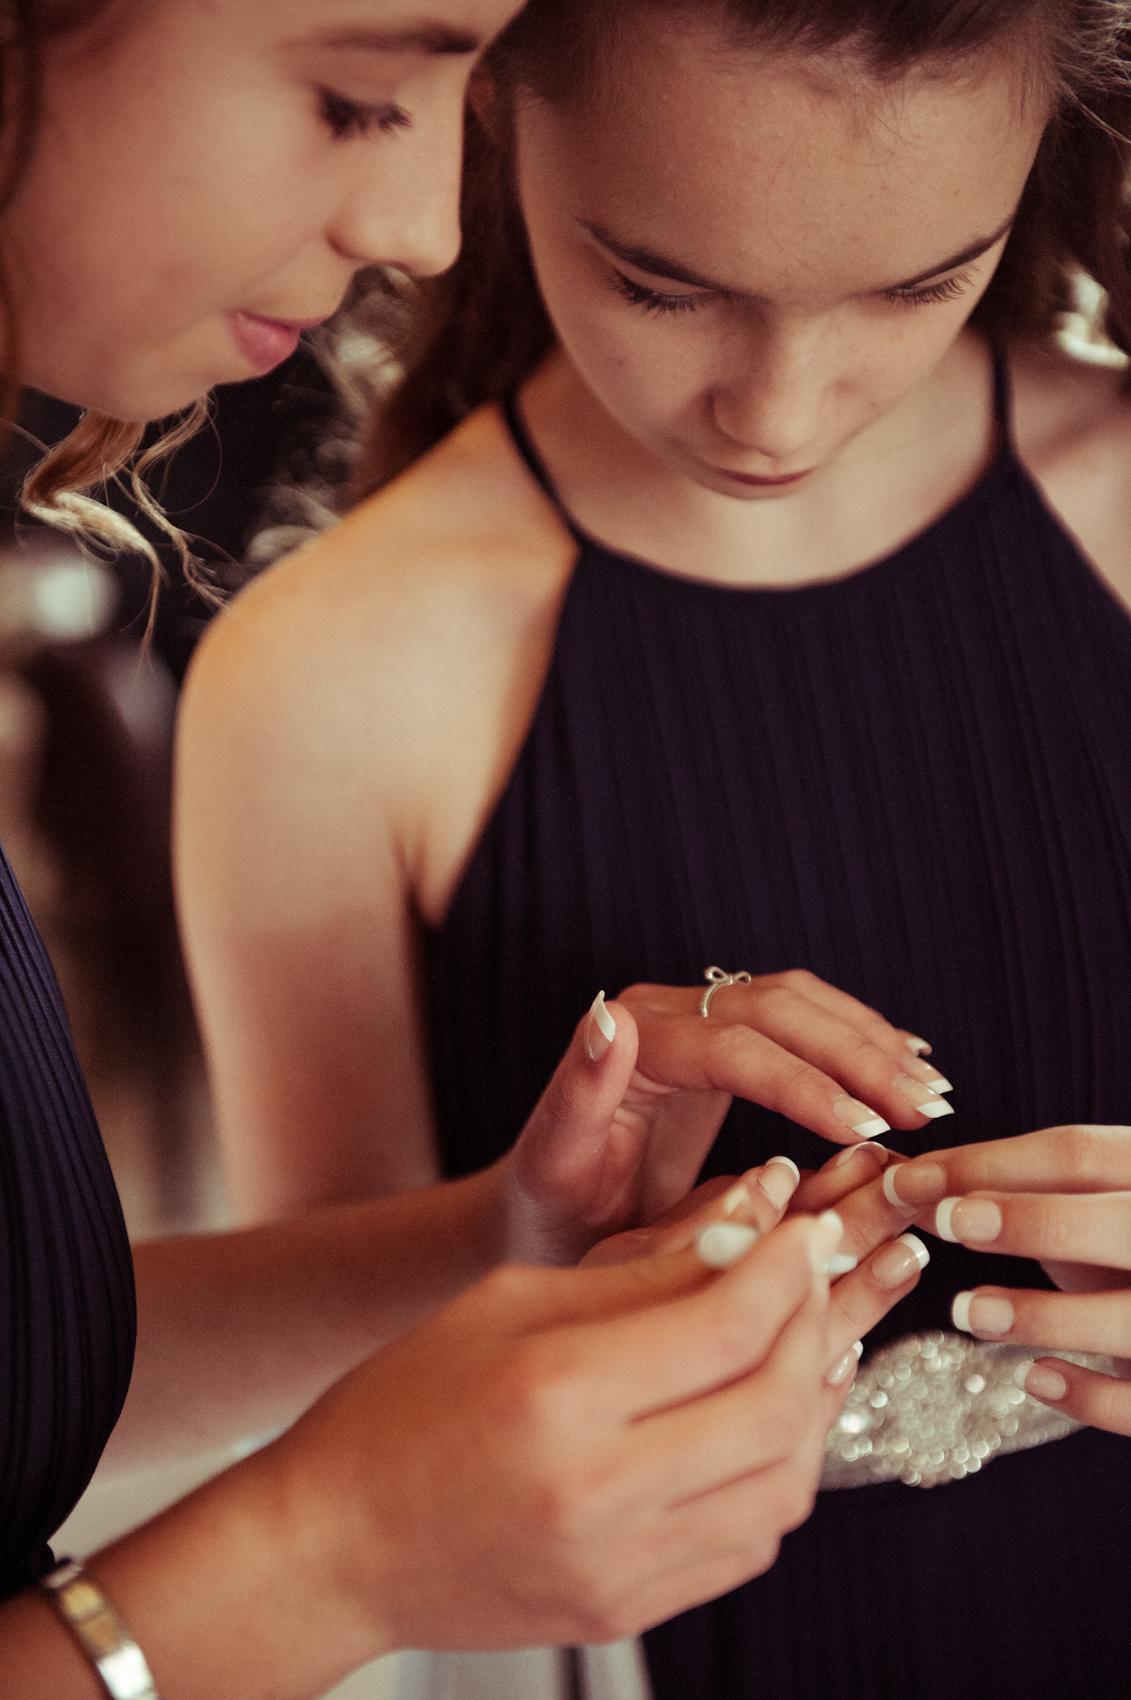 Declan & Emma wedding (7 of 29).jpg